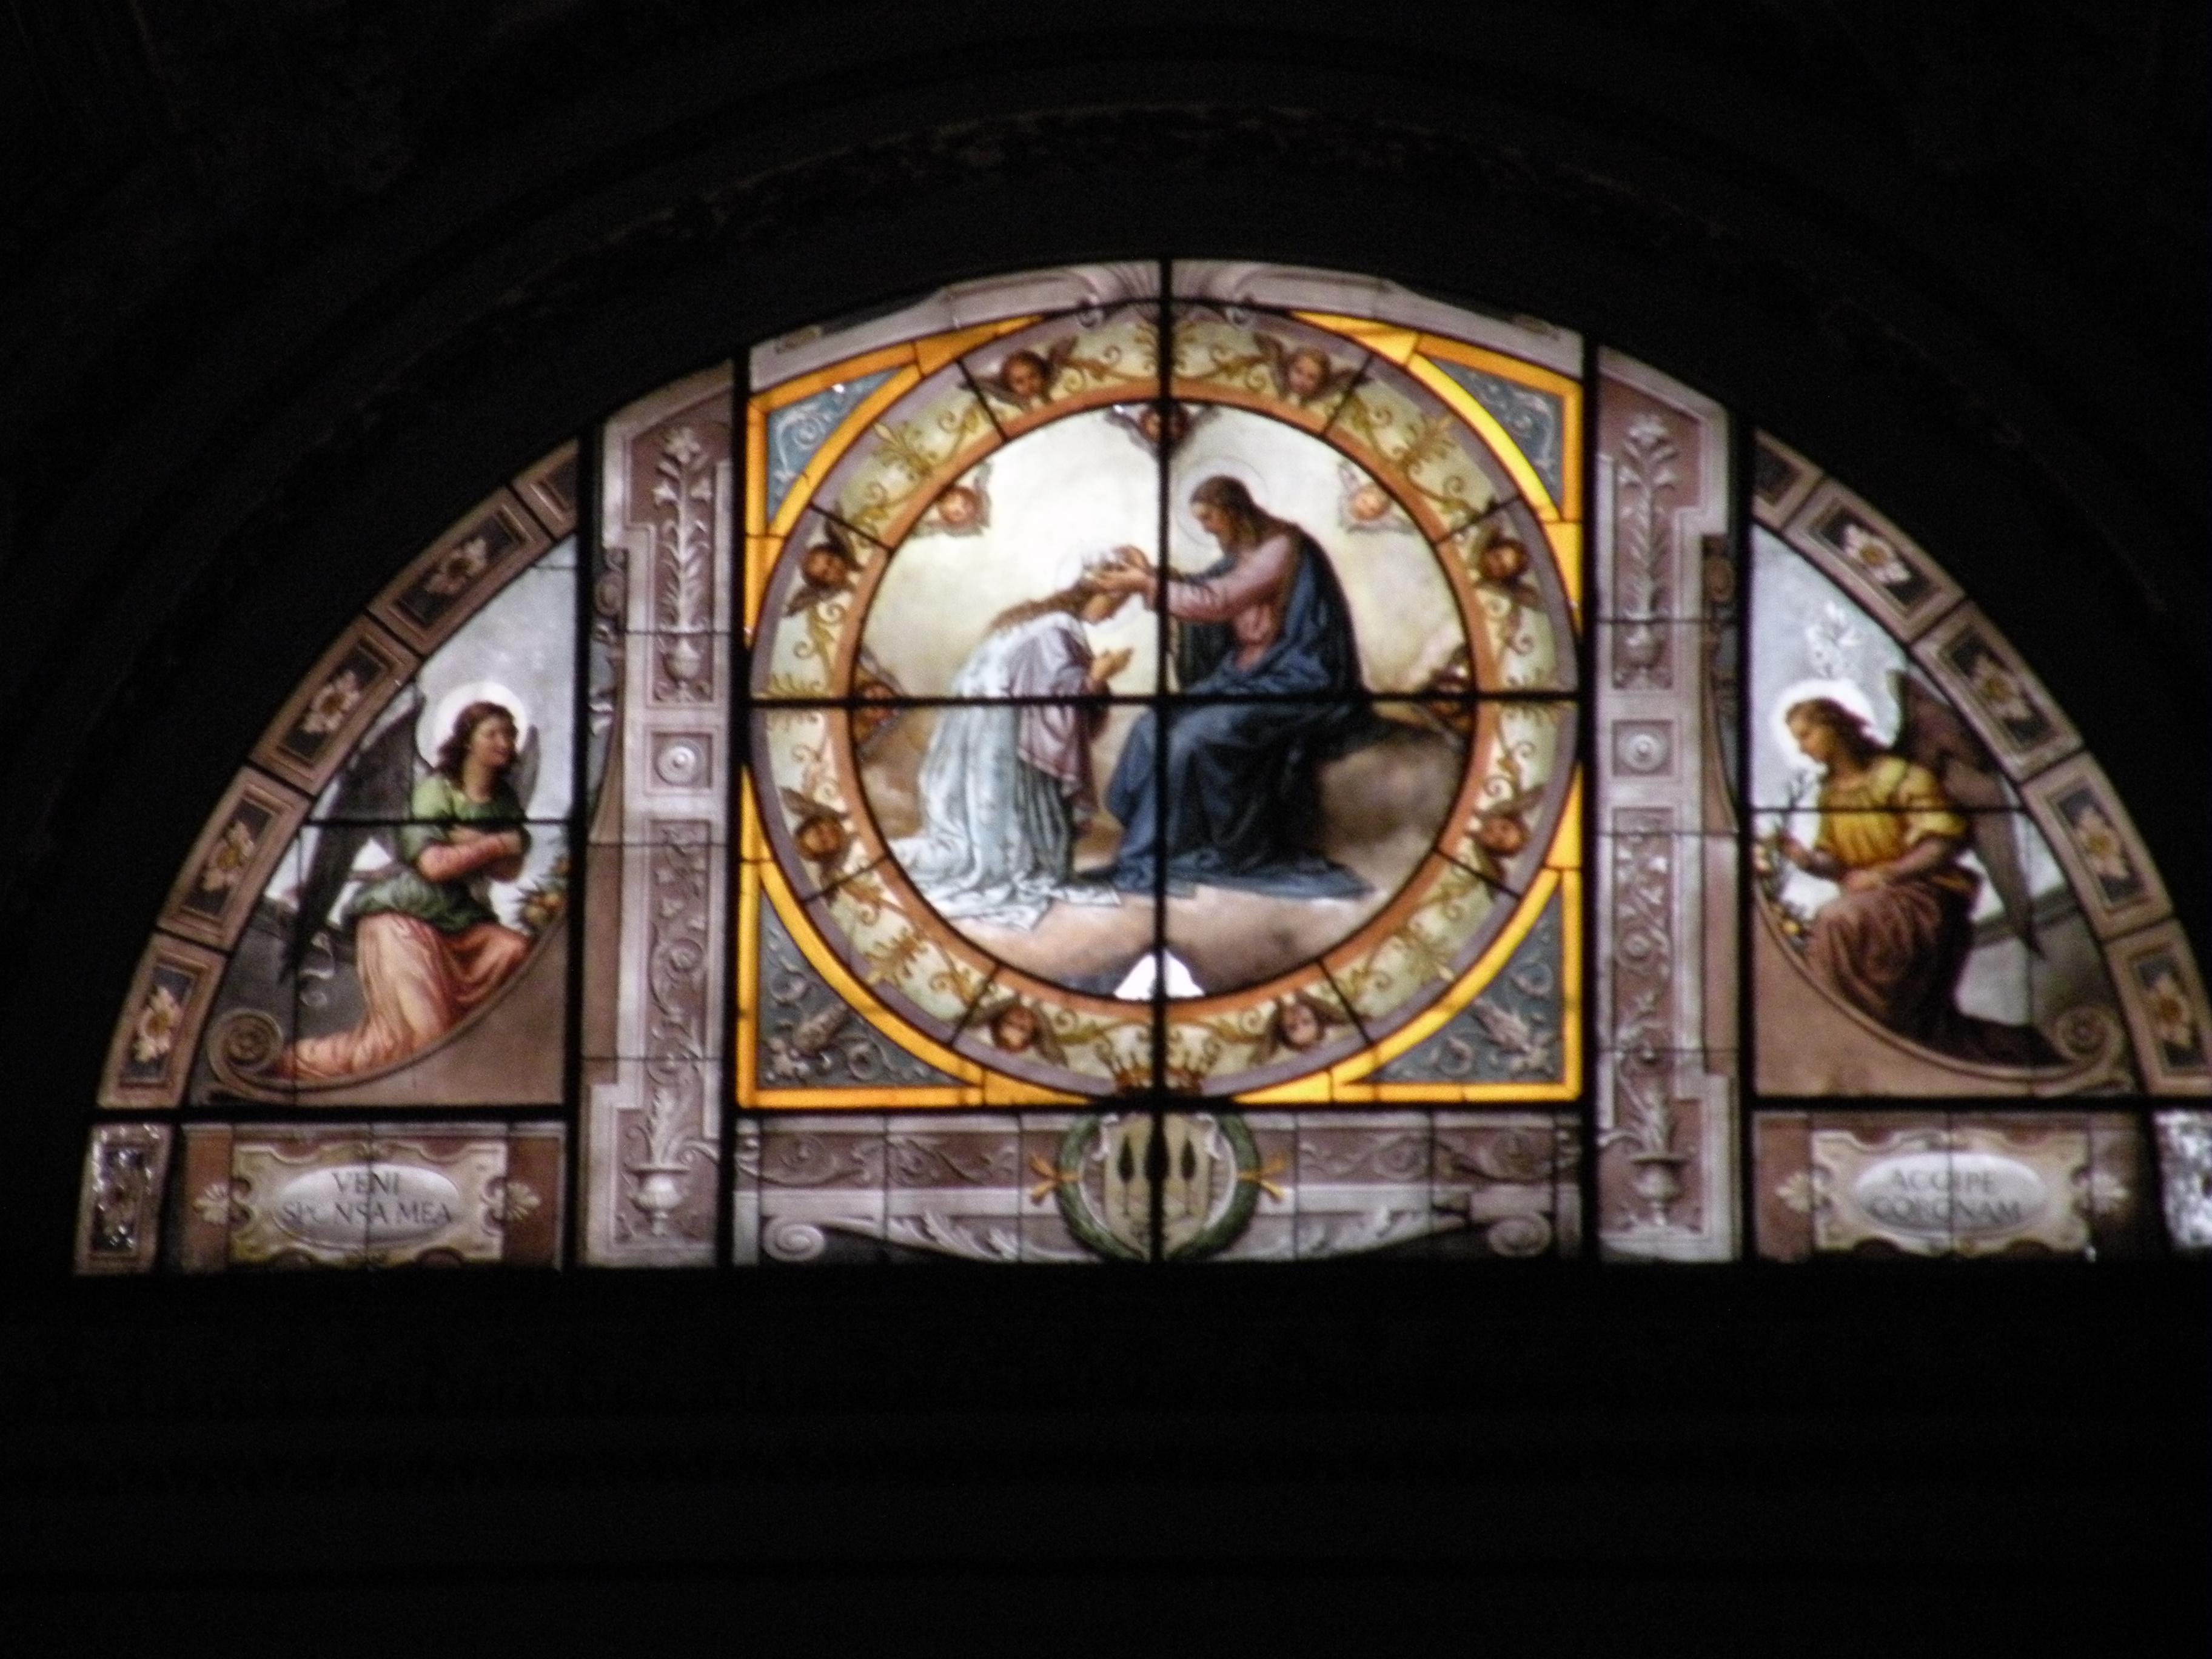 Basilica Santa Maria sopra Minerva, Rome, Italy, (Basilica of St. Mary over Minerva) taken by Martha Wiggins, 2011